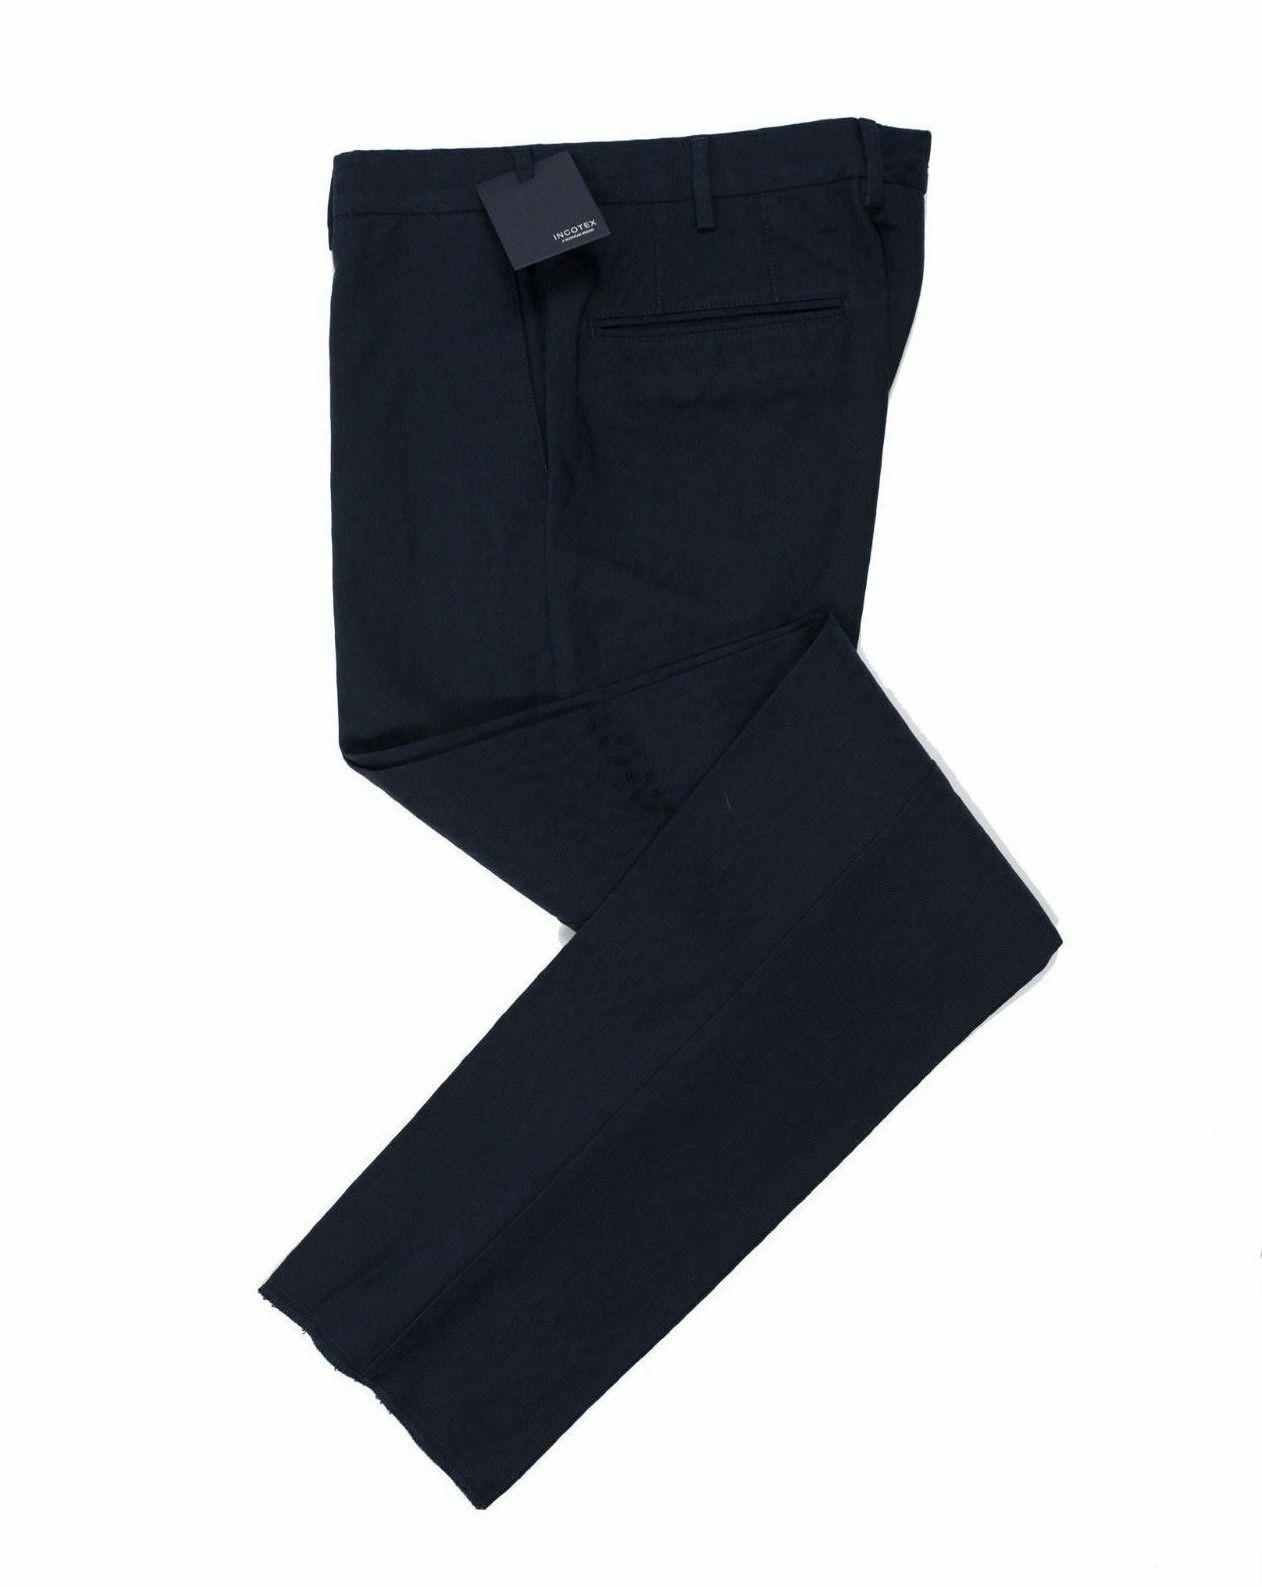 INCOTEX Fancy Navy bluee Cotton Pants   European Fit